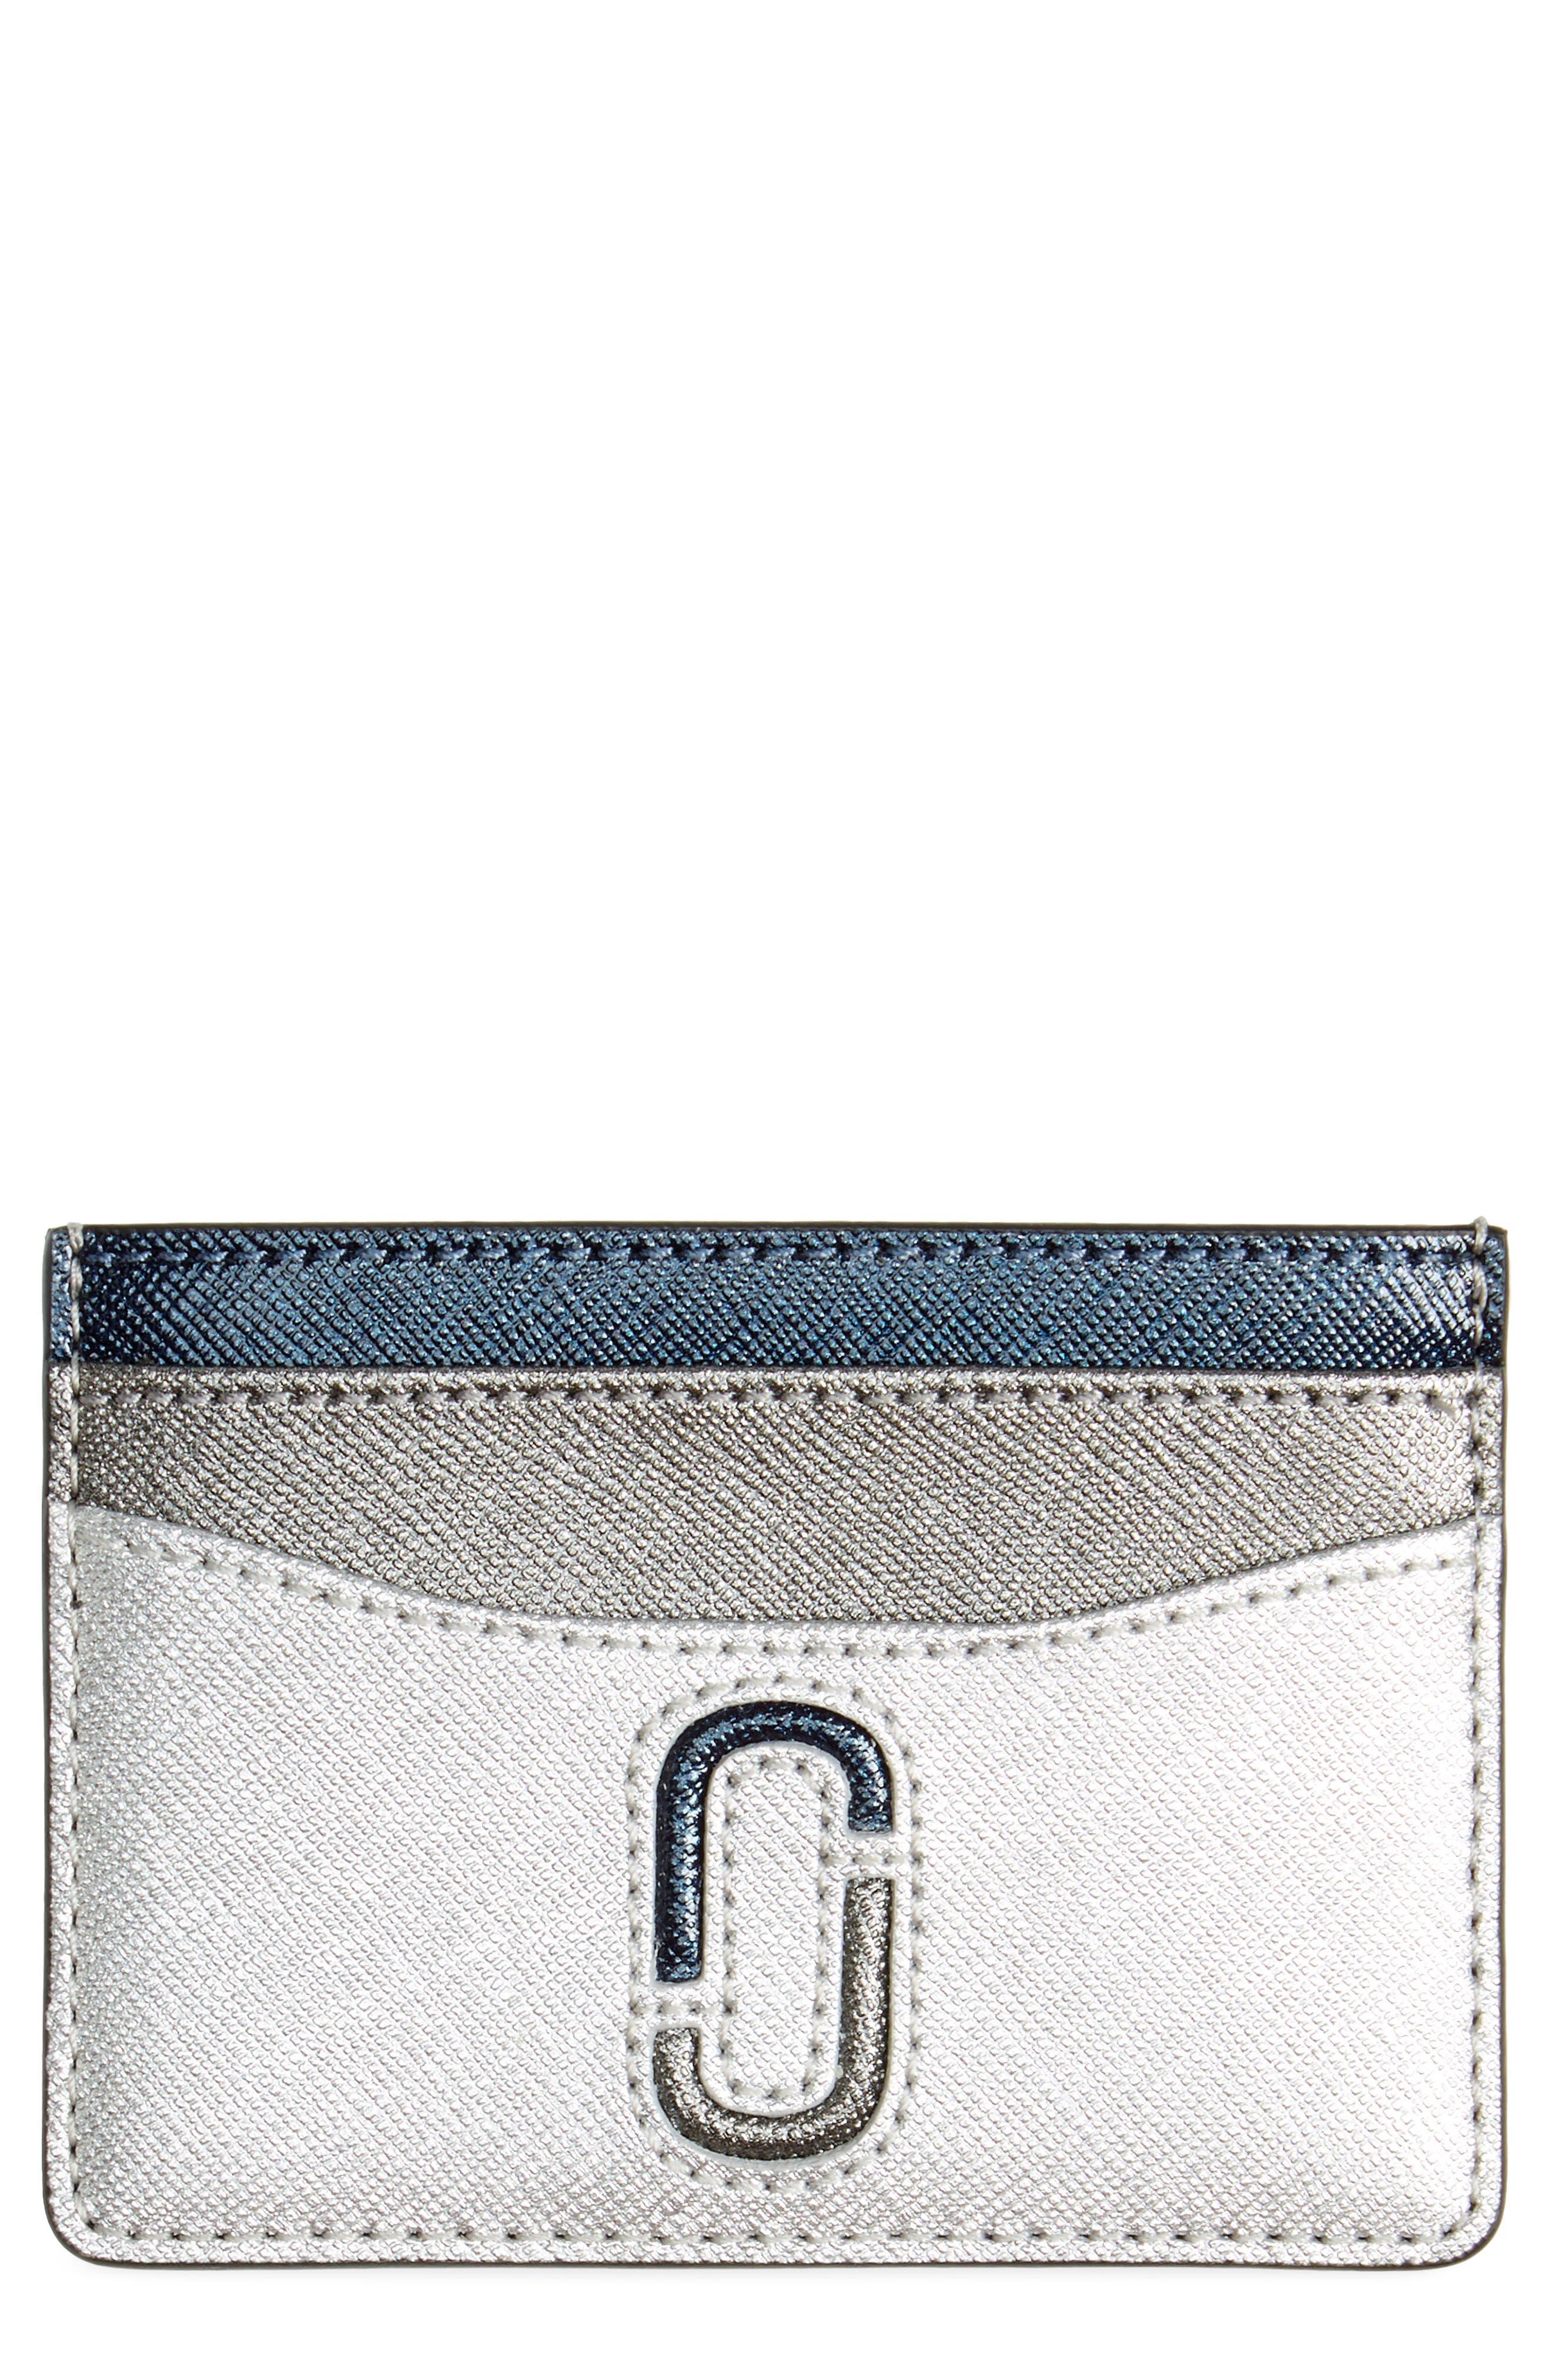 Snapshot Saffiano Leather Card Case,                             Main thumbnail 1, color,                             Silver Multi